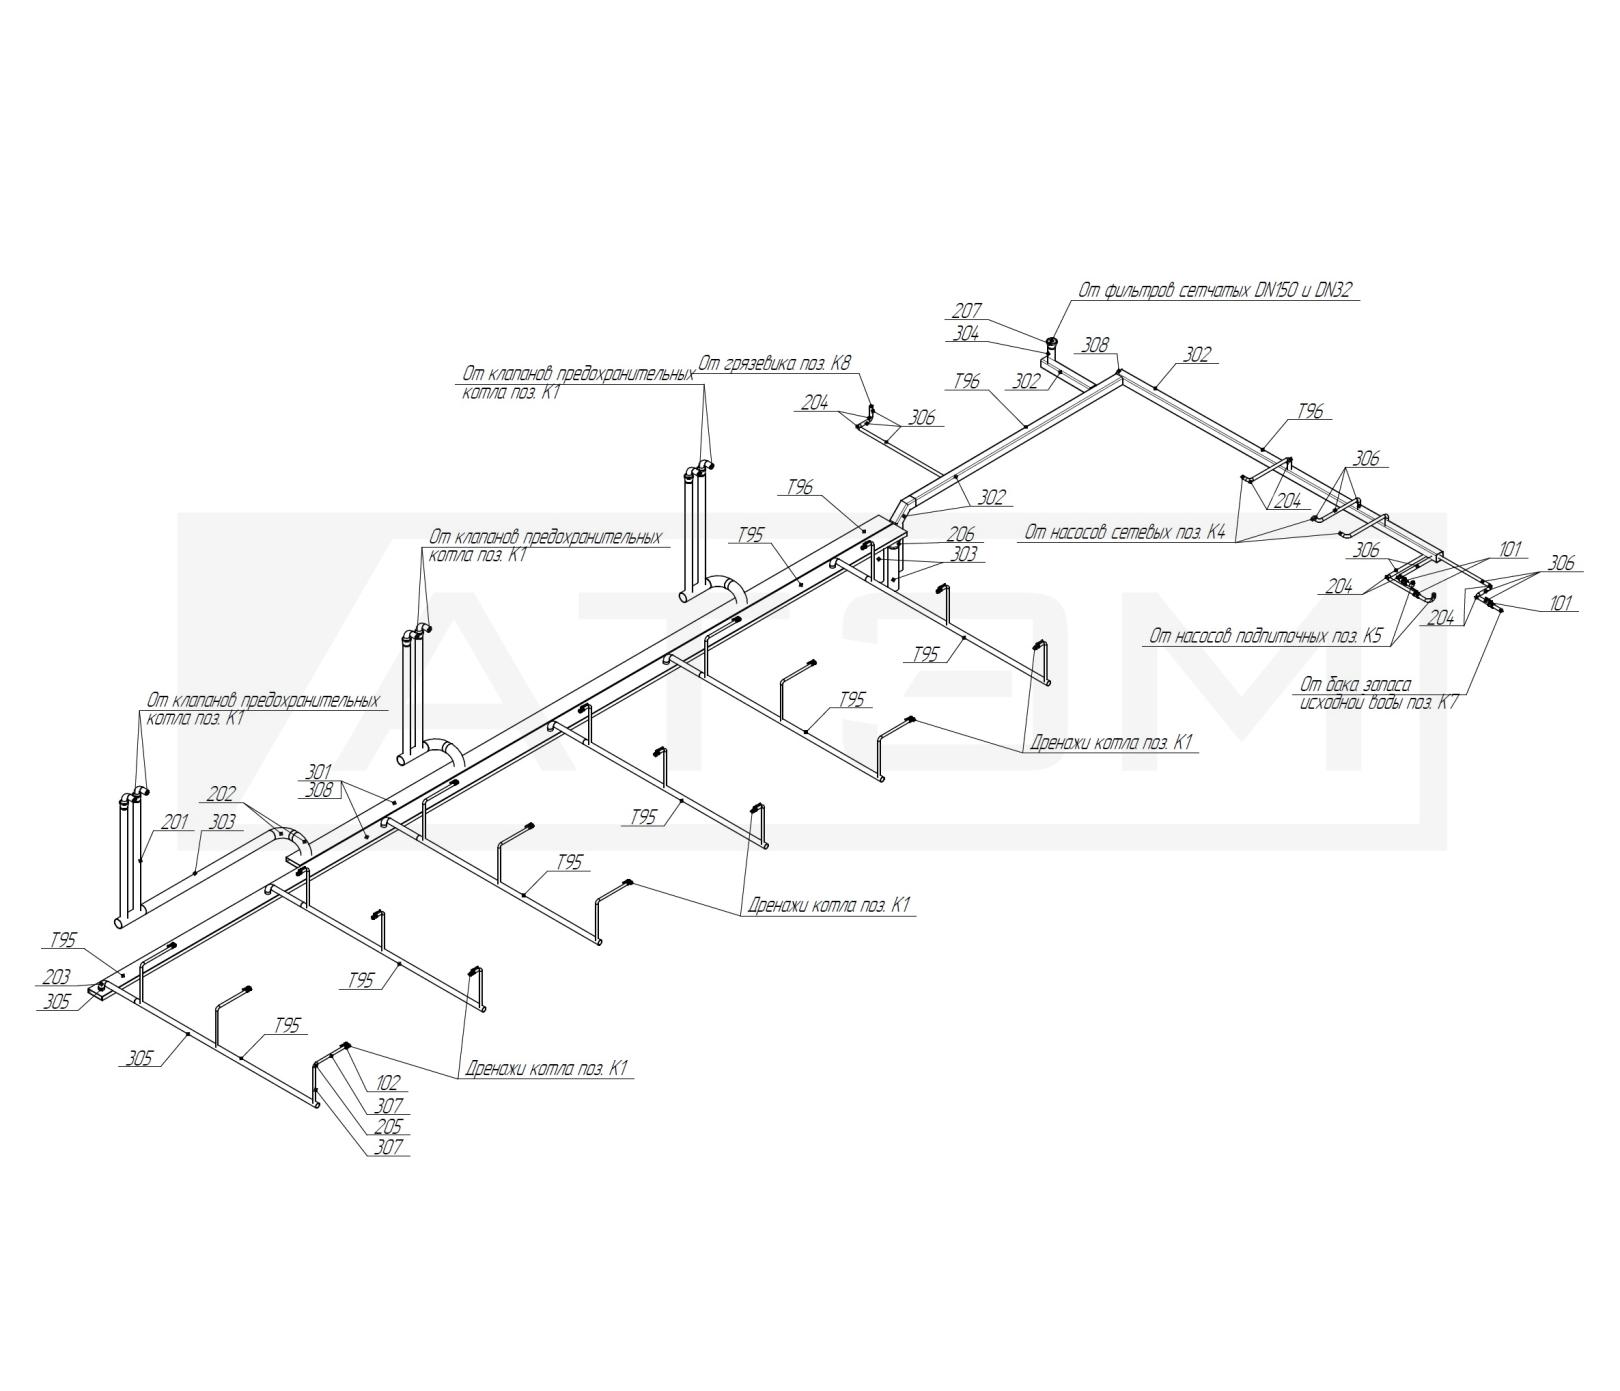 Трубопроводы Т95,Т96. Схема. БМК-7,5 (3хКВм-2,5)